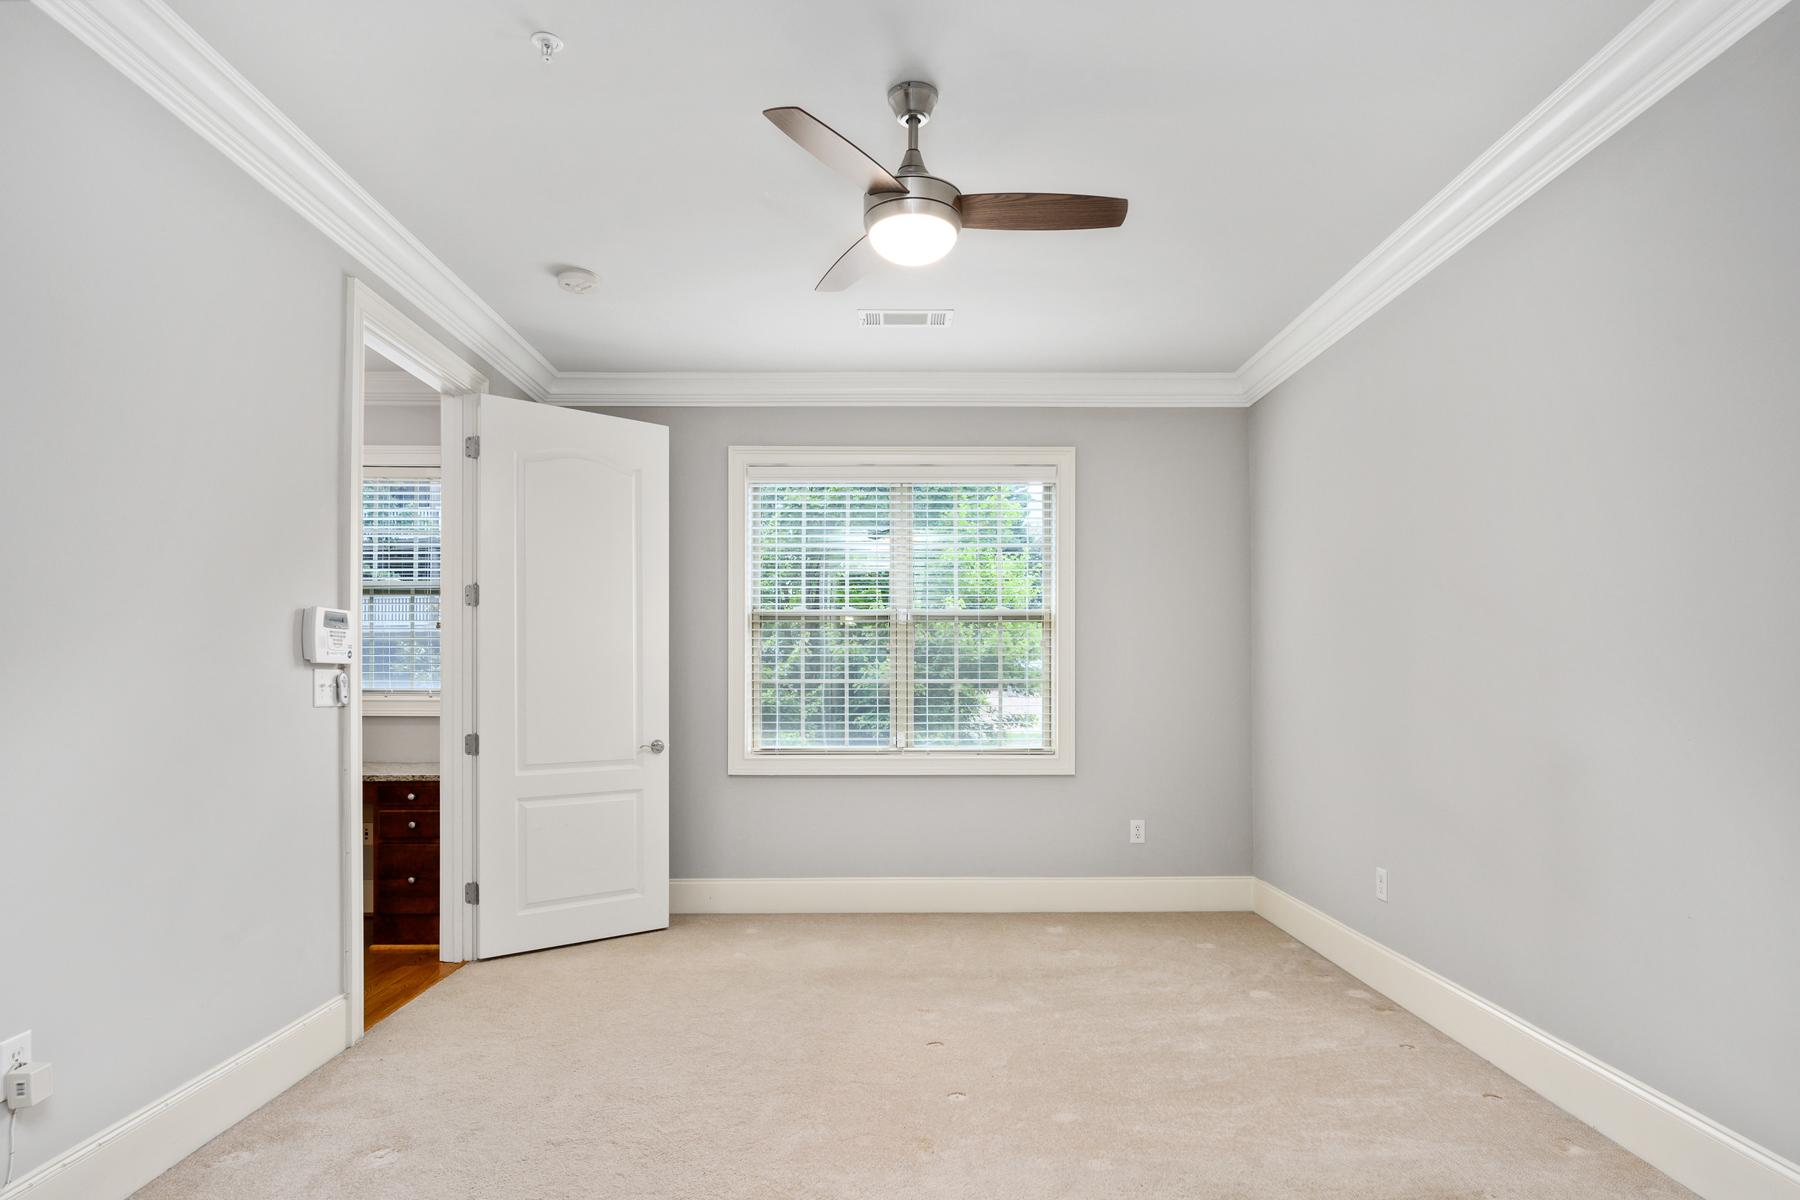 Additional photo for property listing at Fantastic Location 2300 Peachford Road No. 3103, Dunwoody, Джорджия 30338 Соединенные Штаты